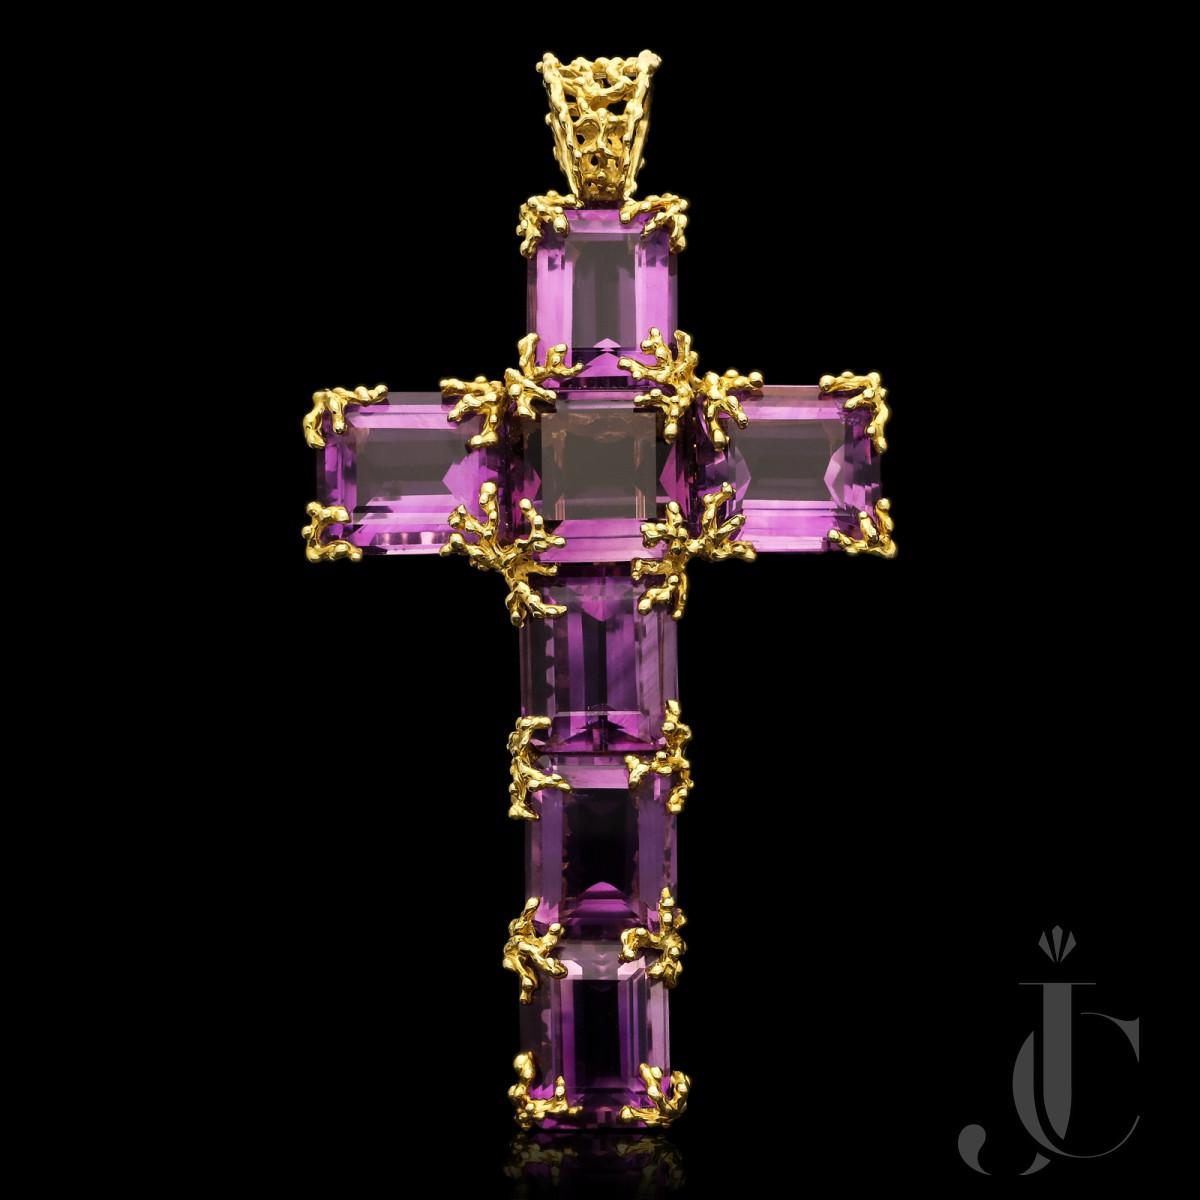 Barbara Anton - Large Amethyst & 18k Gold Cross c.1970s